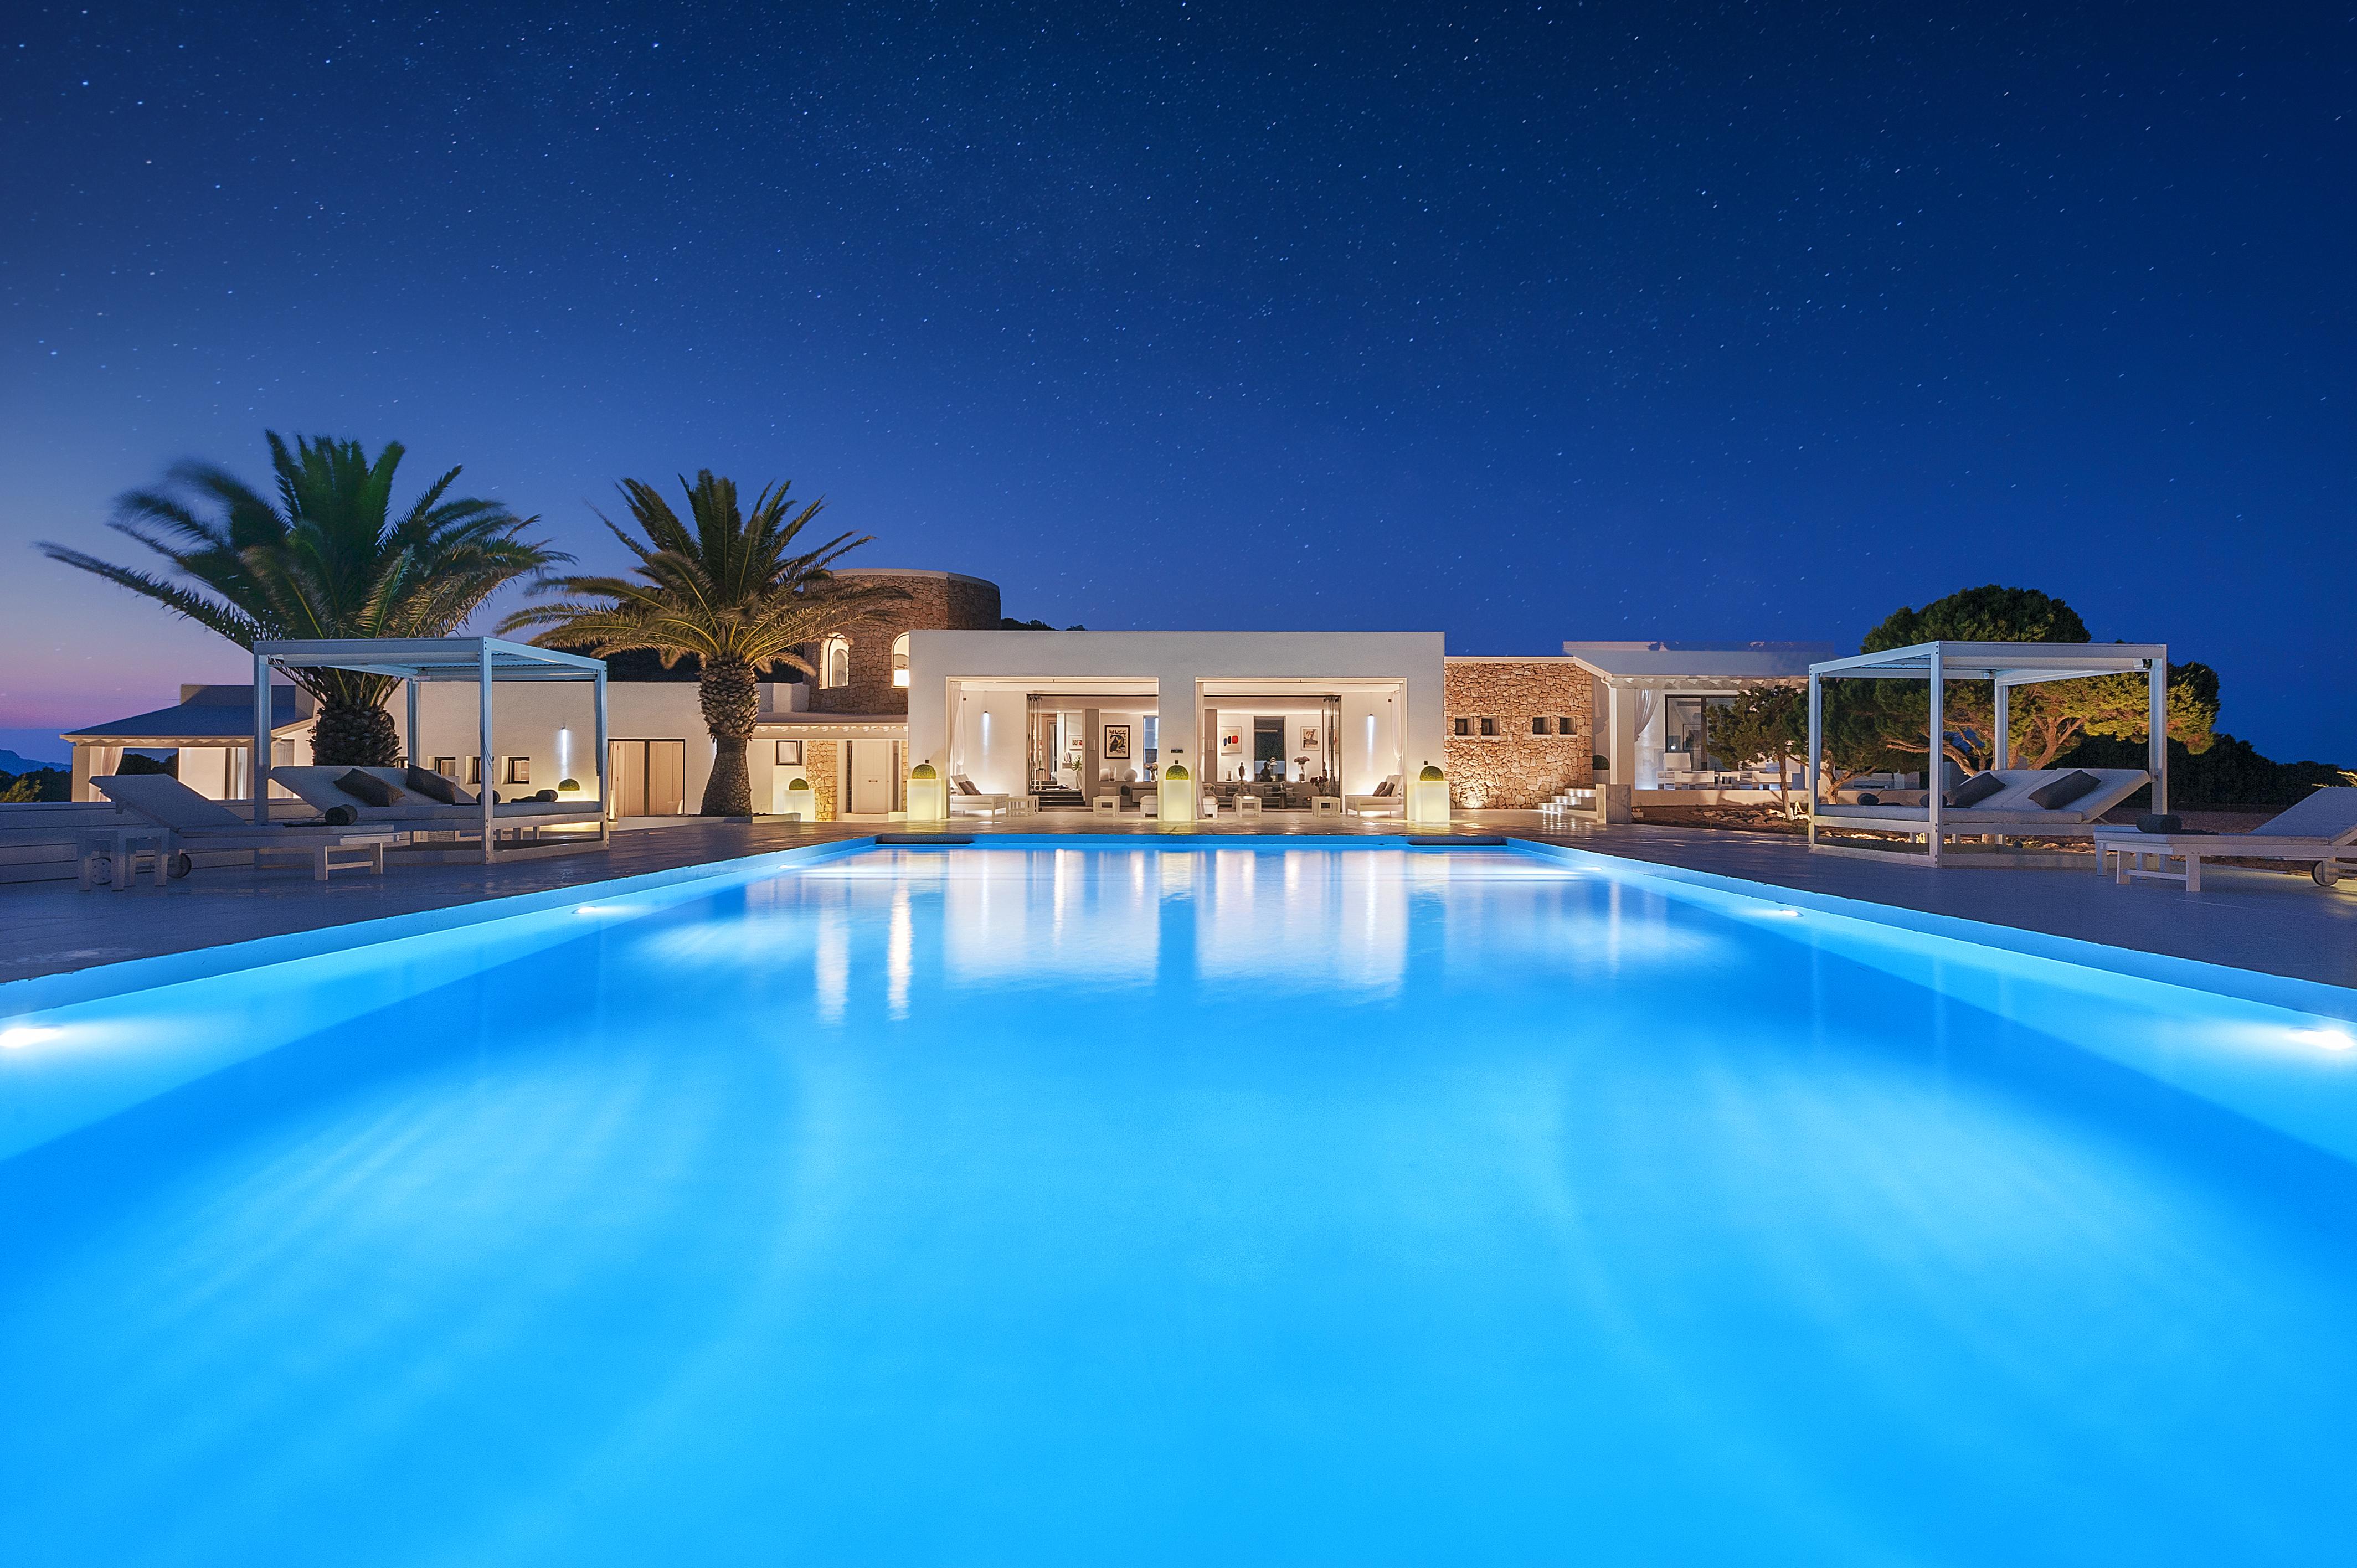 tagomago-island-swimming-pool